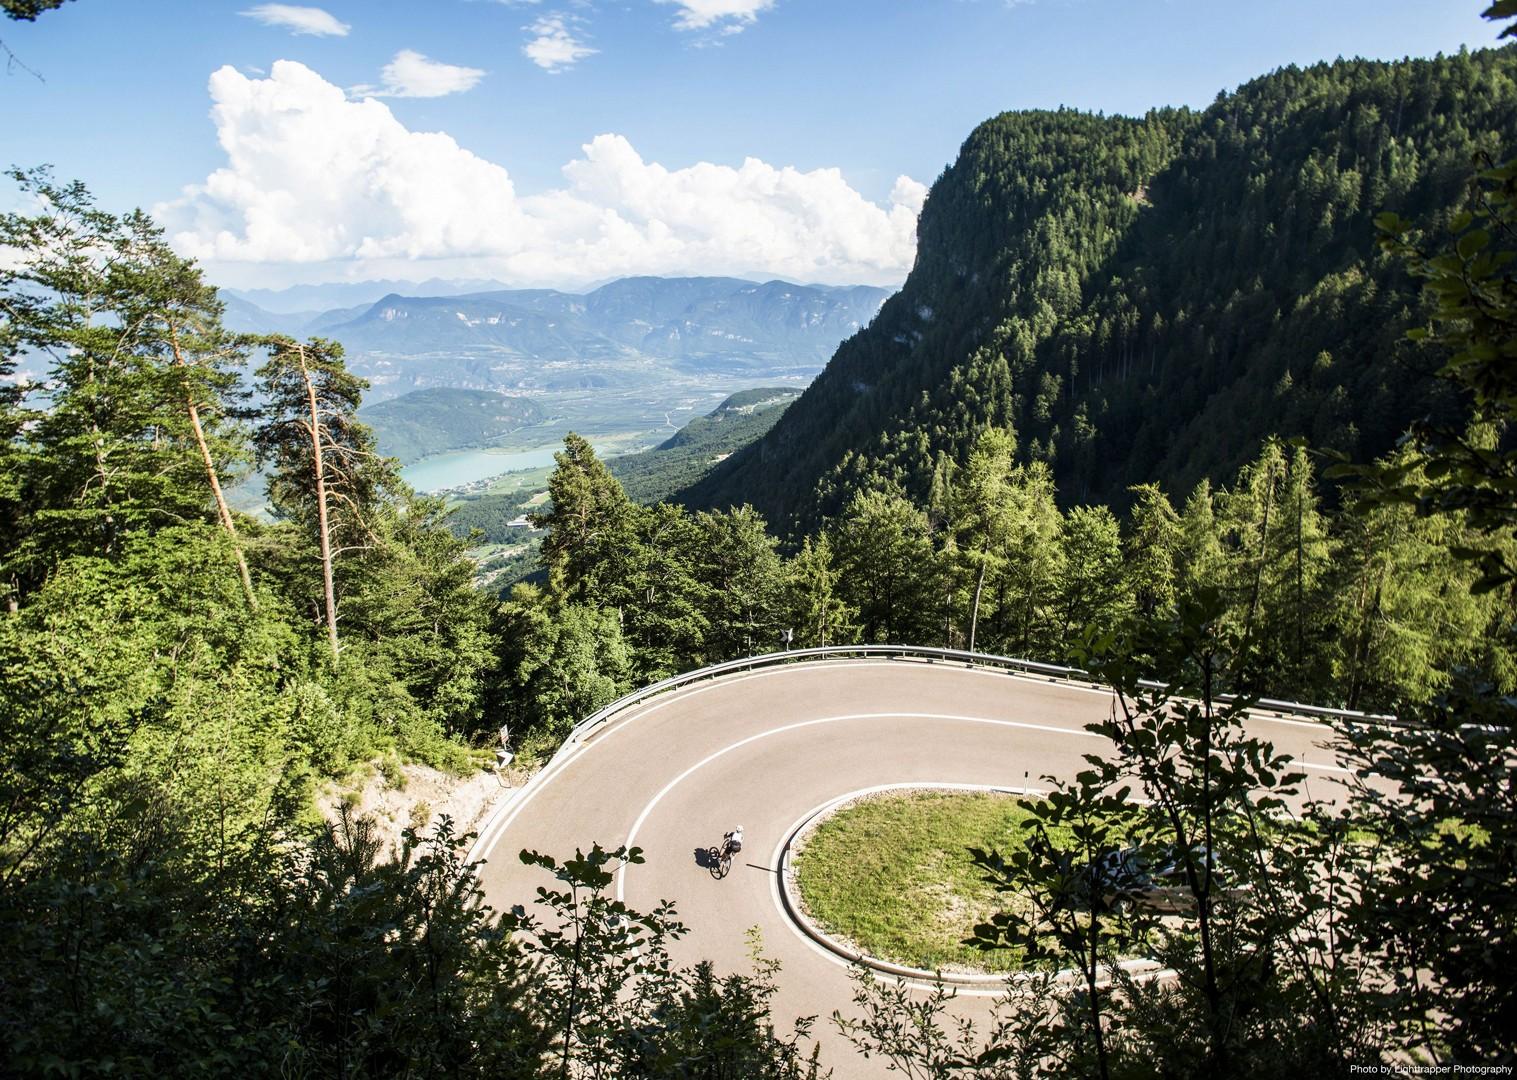 guided-road-cycling-holiday-italy-italian-alps.jpg - Italy - Italian Alps Introduction - Guided Road Cycling Holiday - Italia Road Cycling